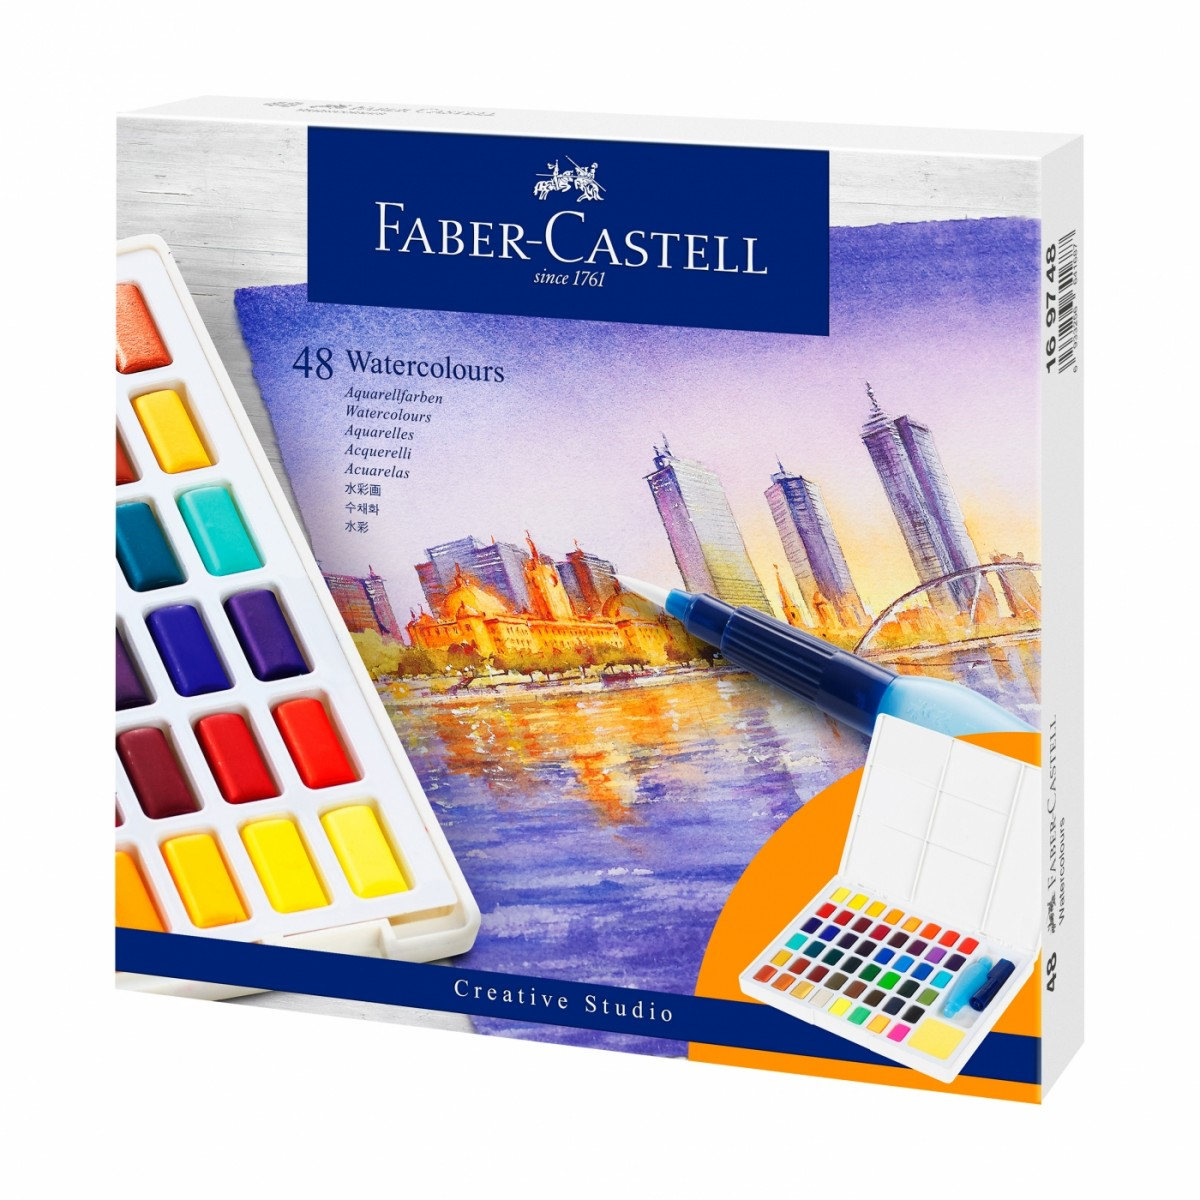 FaberCastellAkvarelstStudiokvalitet-01